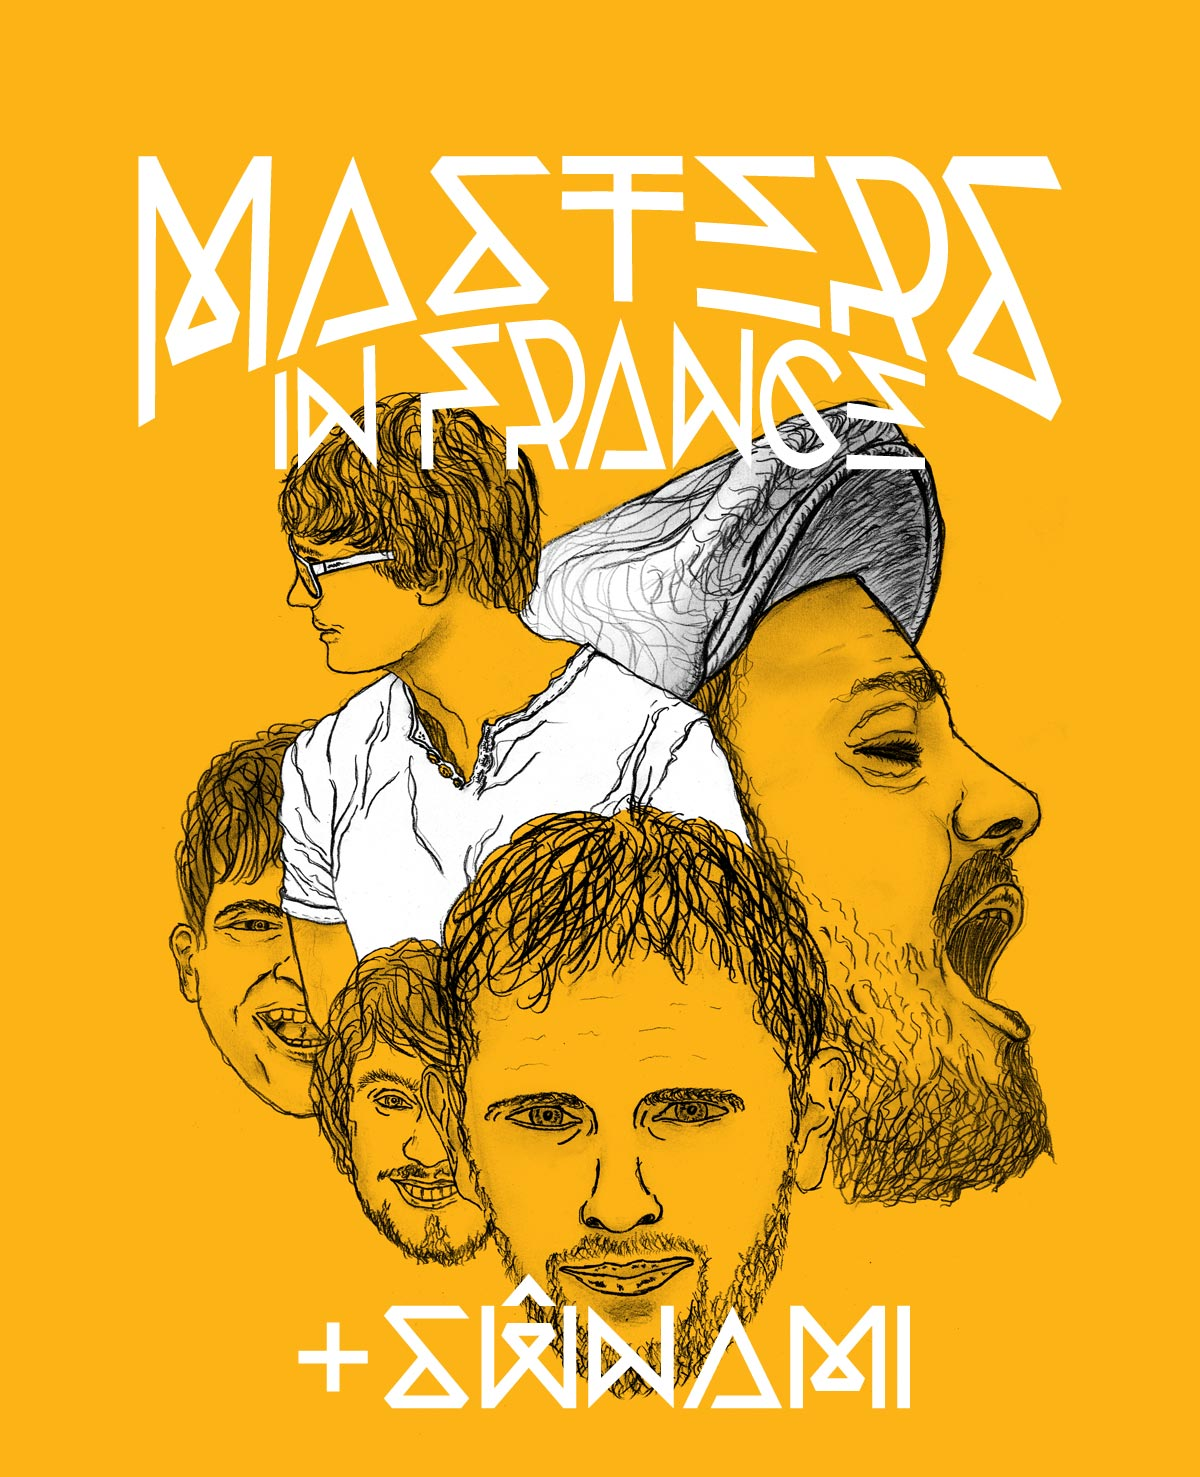 Masters in France illustration